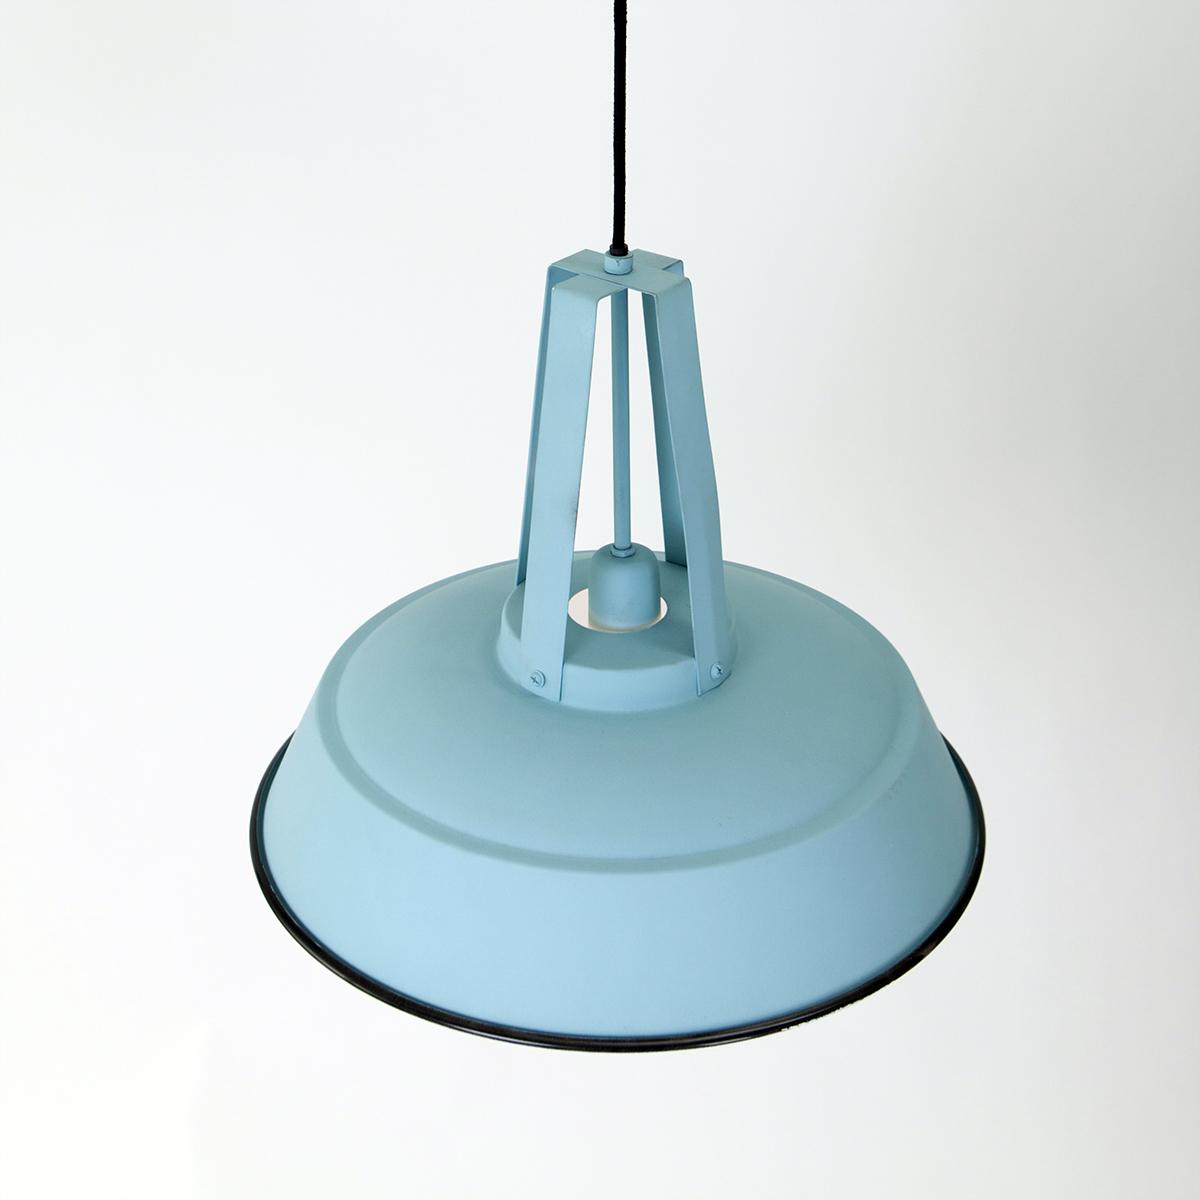 Hanglampen Spots Vloerlampen Wandlampen Plafondlampen Tafellampen